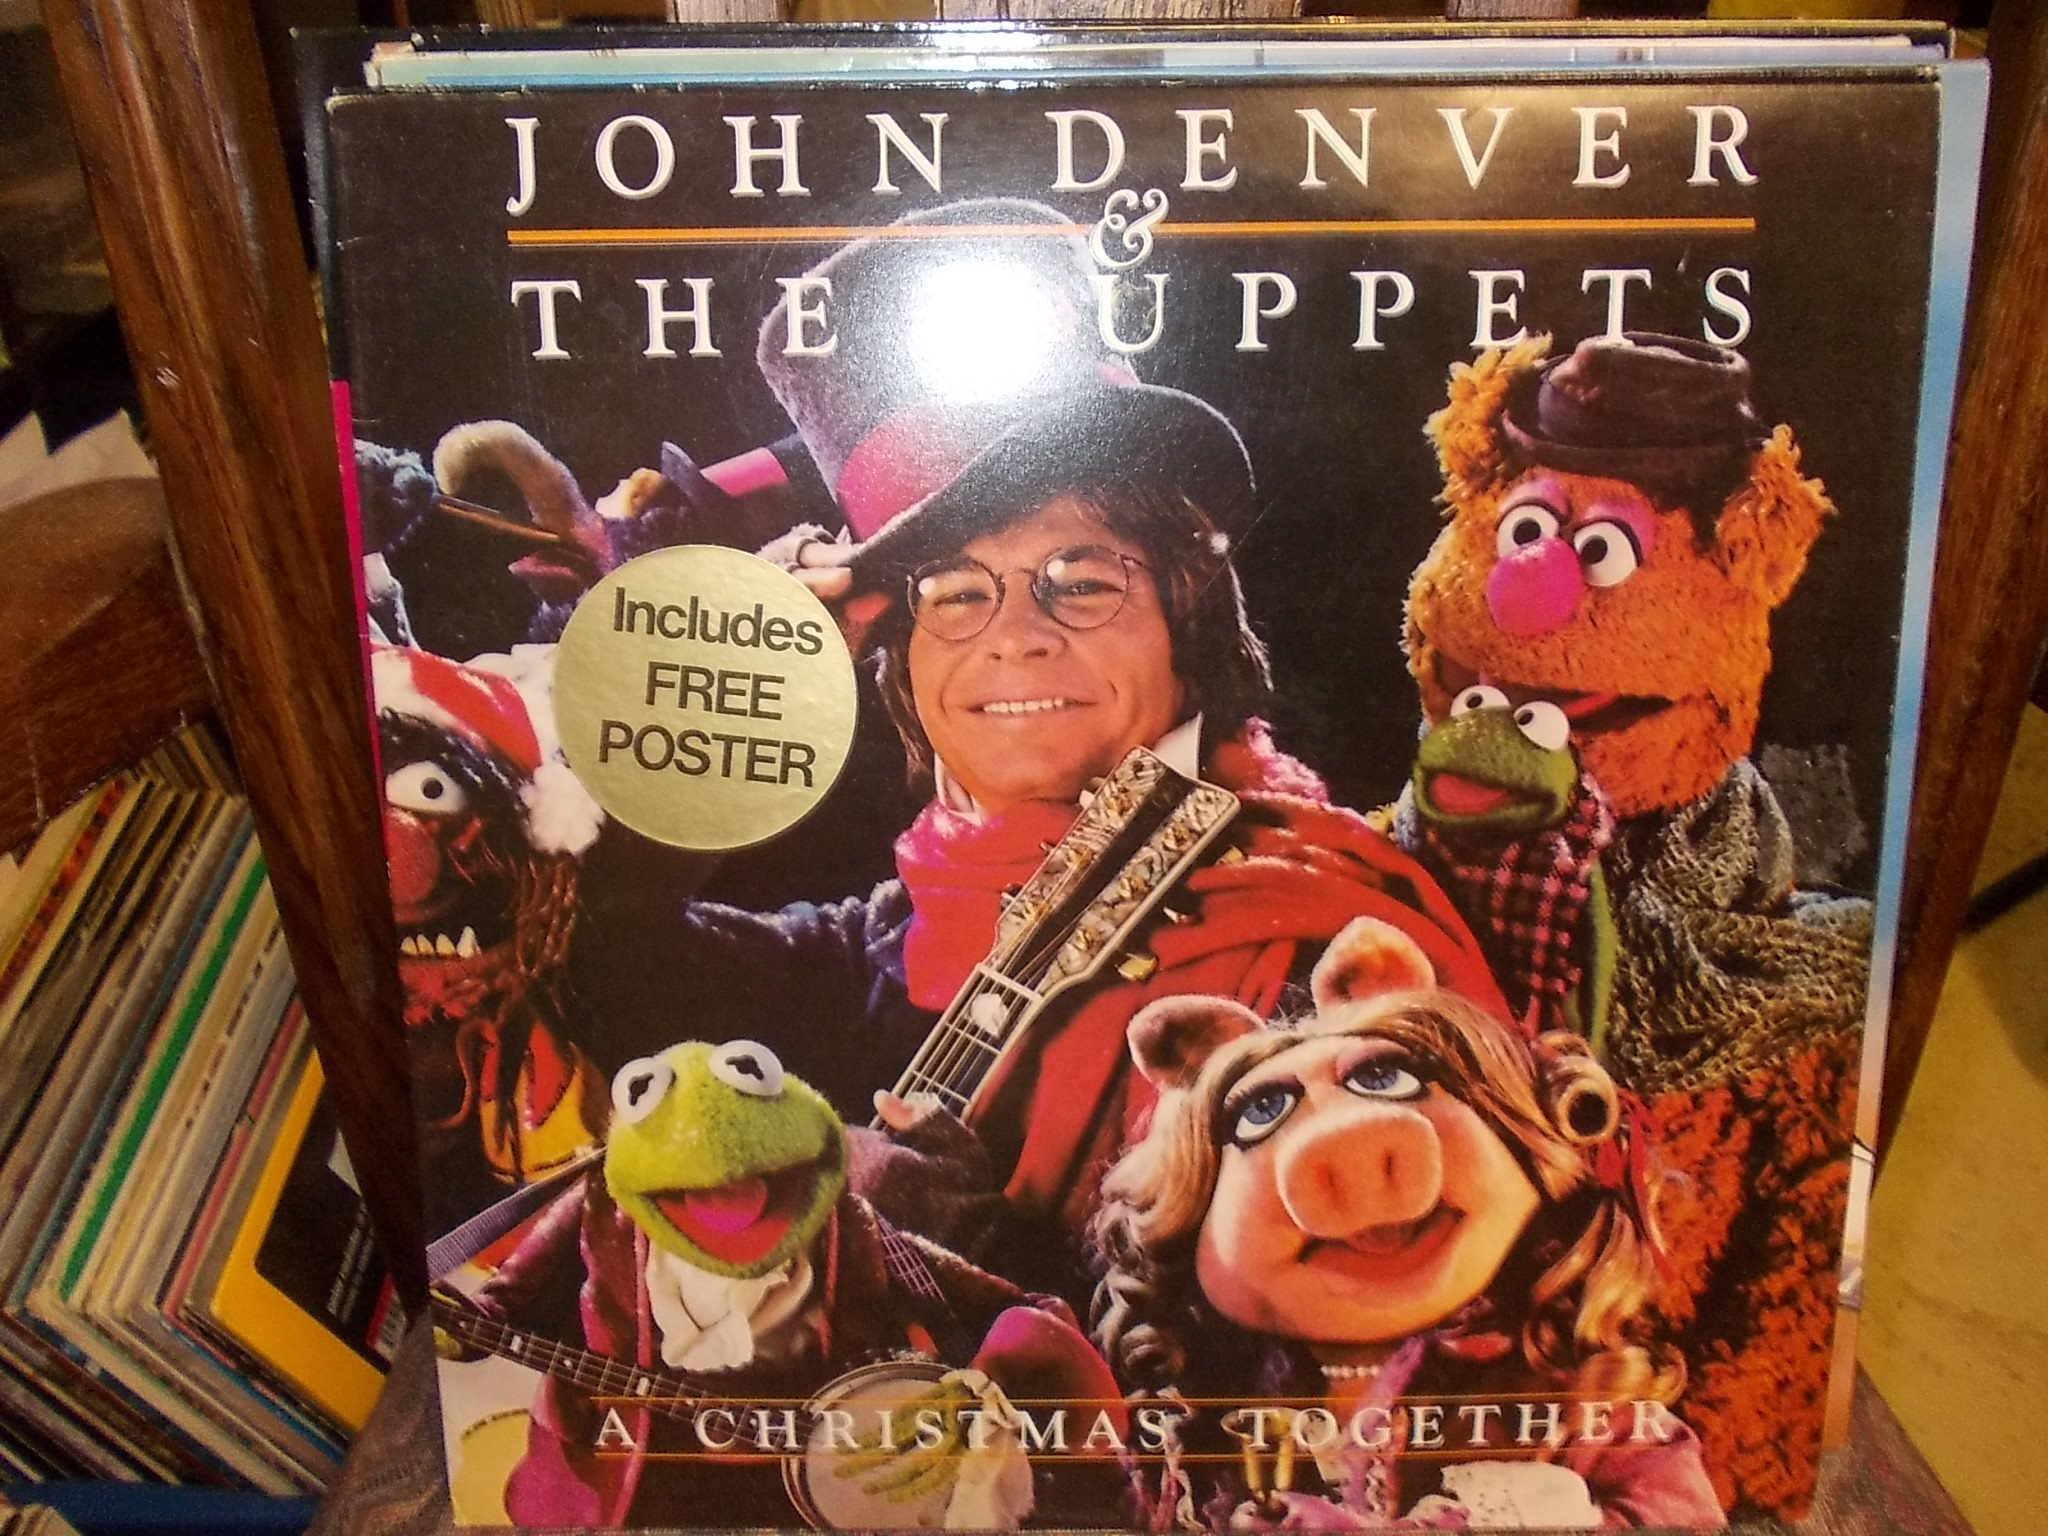 John Denver and the Muppets-AChristmas together (317822357) ᐈ Köp ...